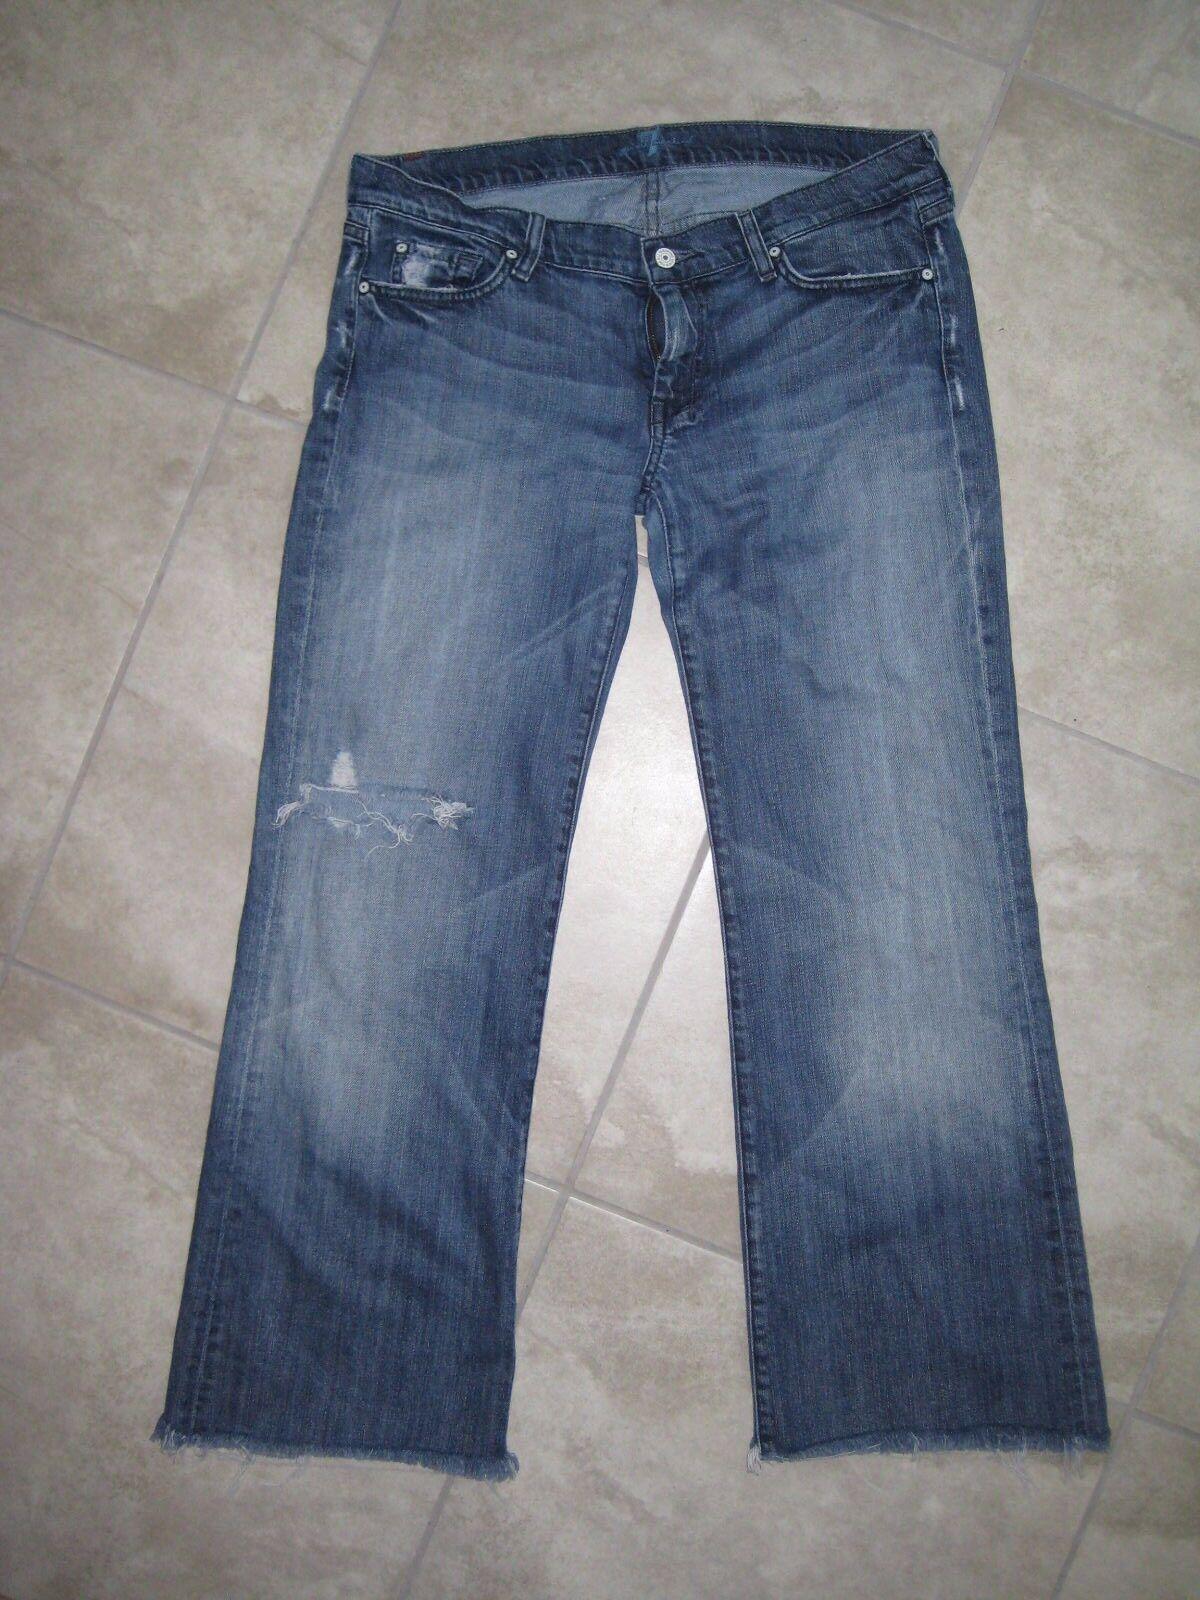 Grunge 7 for All Mankind Flare Wide Leg Dojo Denim Jeans Women's Pants 32 USED